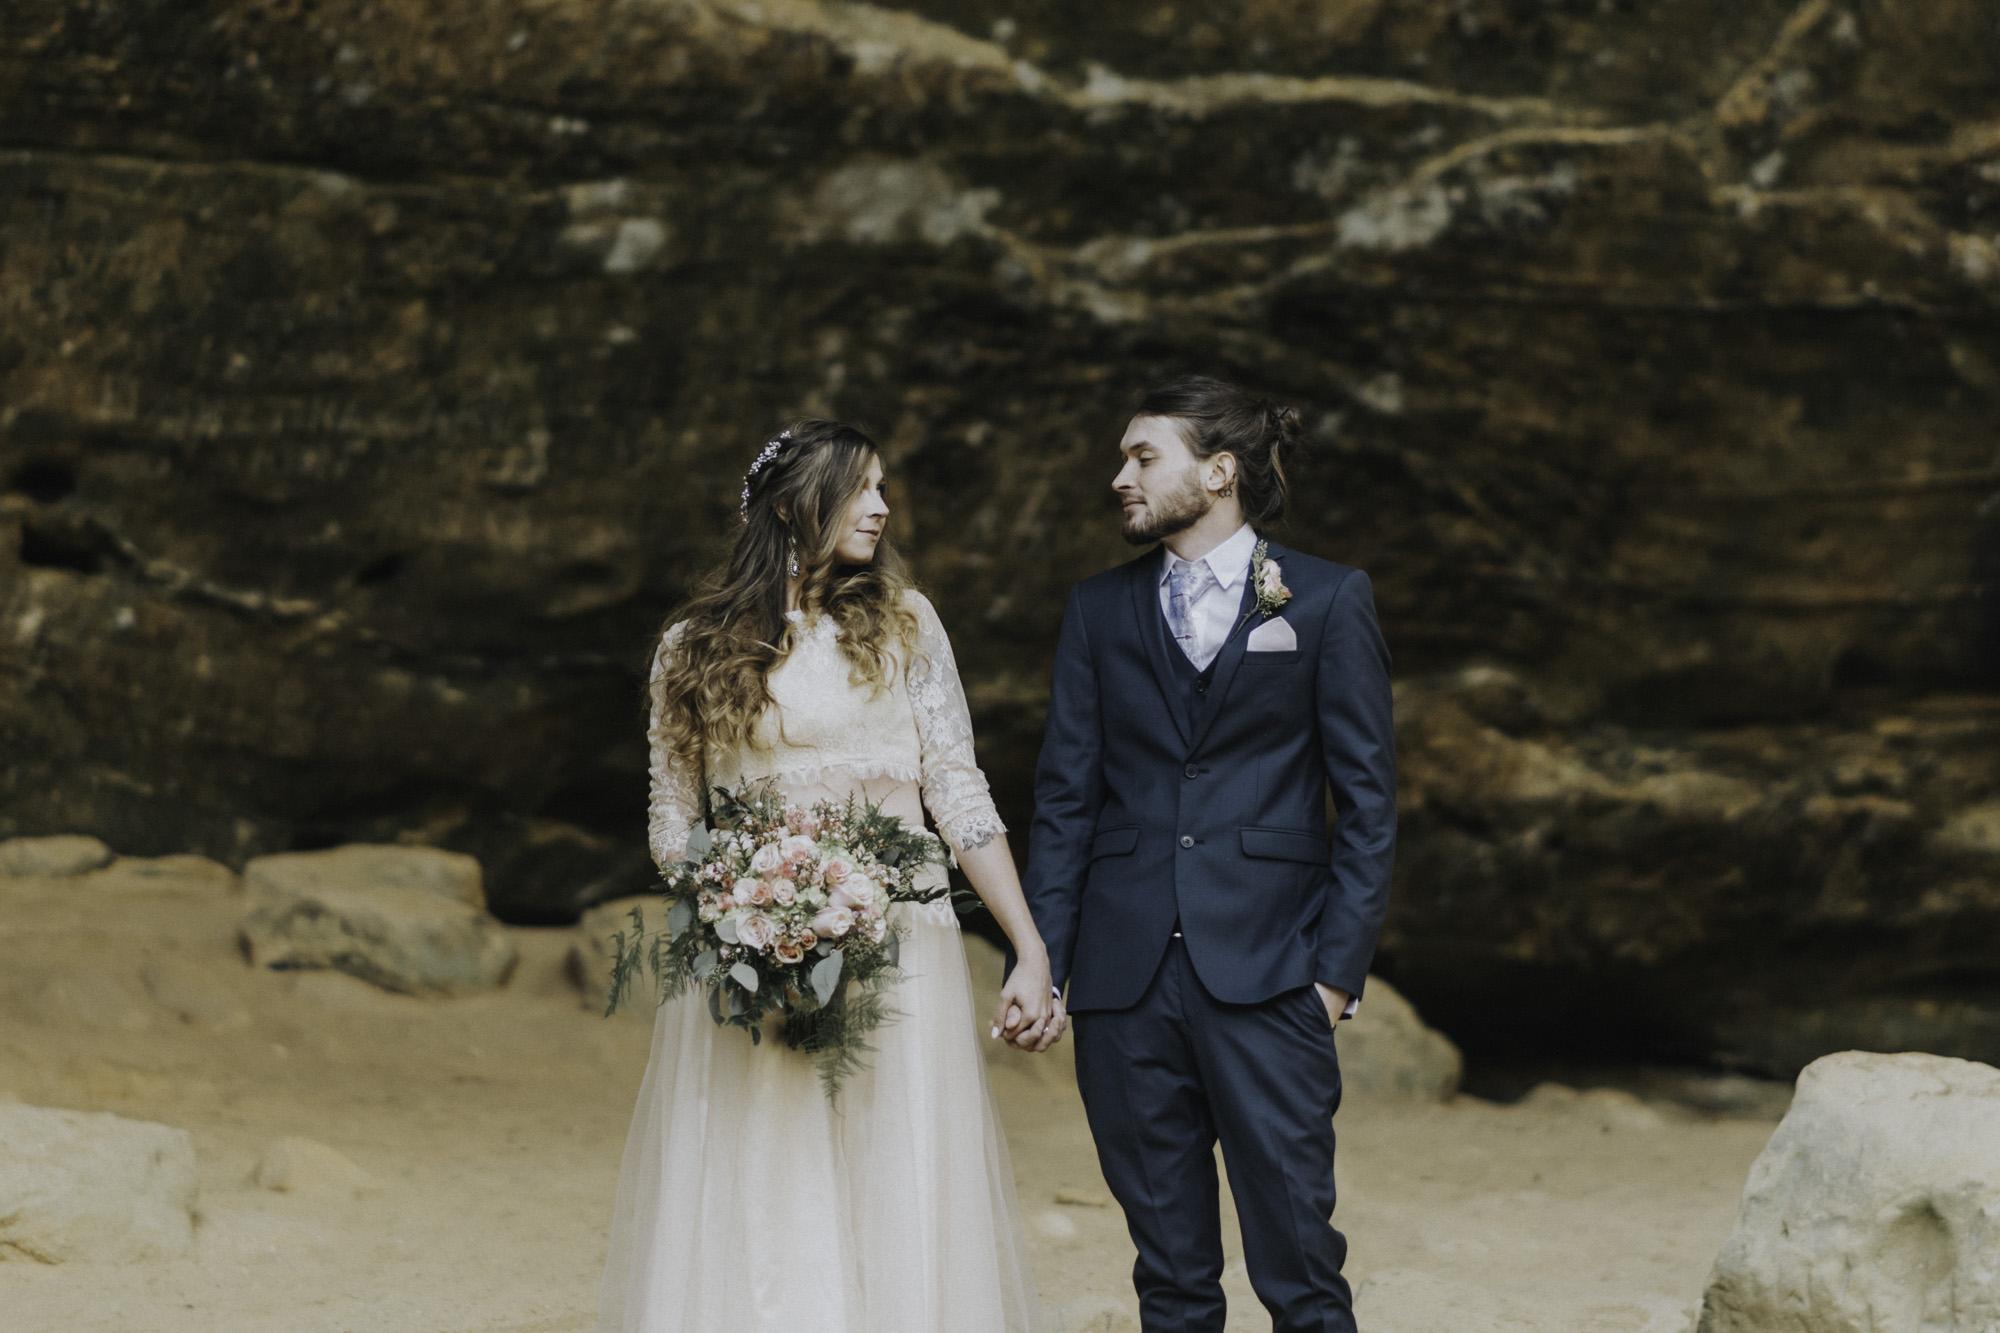 Cate_Ann_Photography_Dayton_Ohio_Wedding_Elopement_And_Engagement_PhotographerDSC_5911.jpg